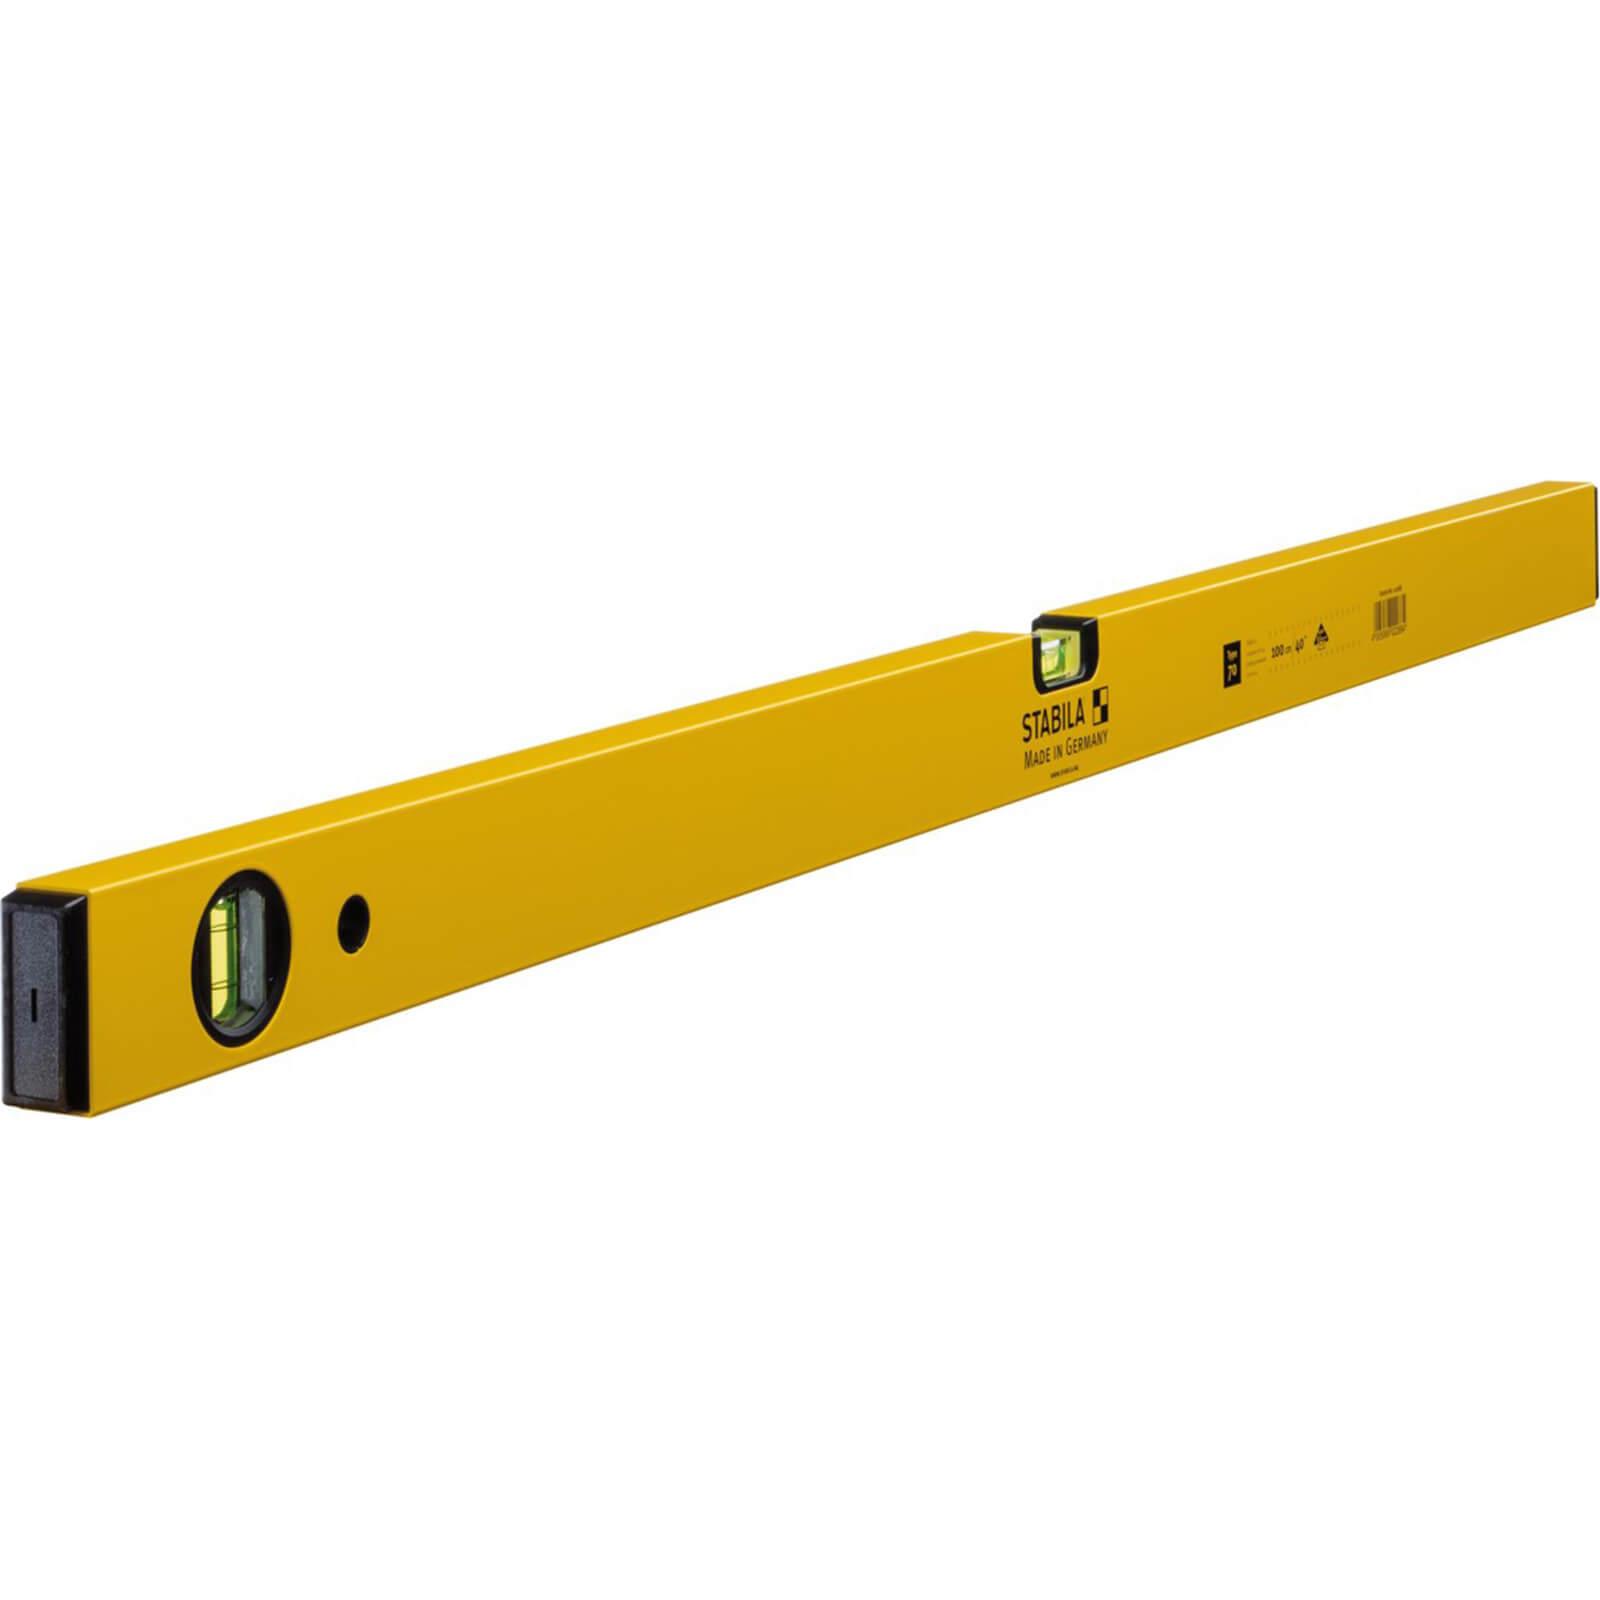 Stabila 70-120 Single Plumb 2 Vial Spirit Level 120cm / 48